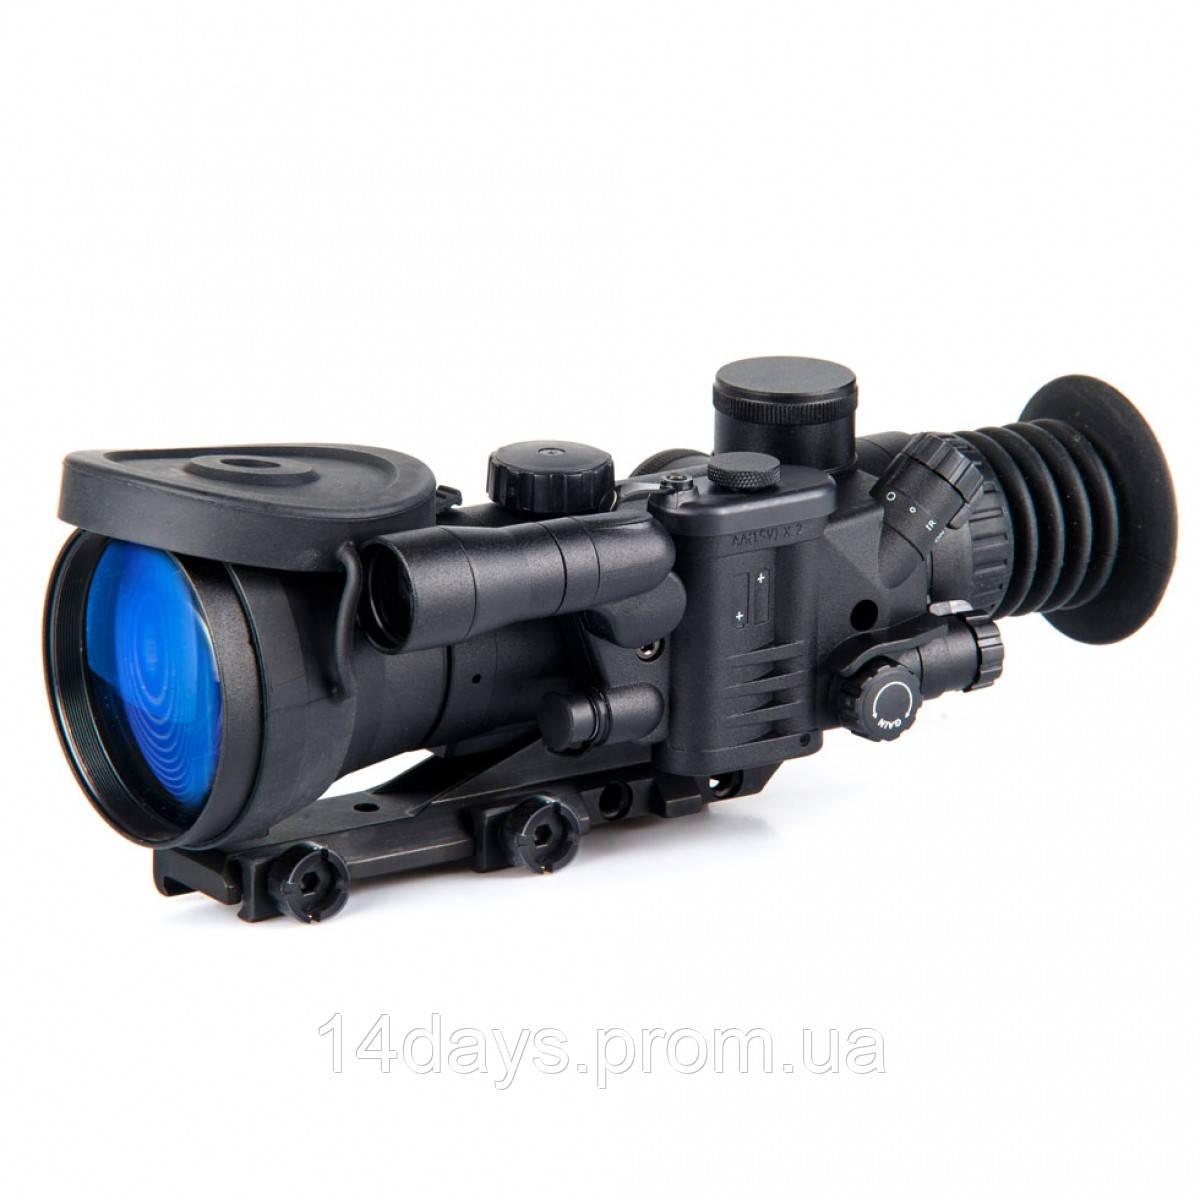 Прицел ночного видения Dedal-490 DK3 BW (100)